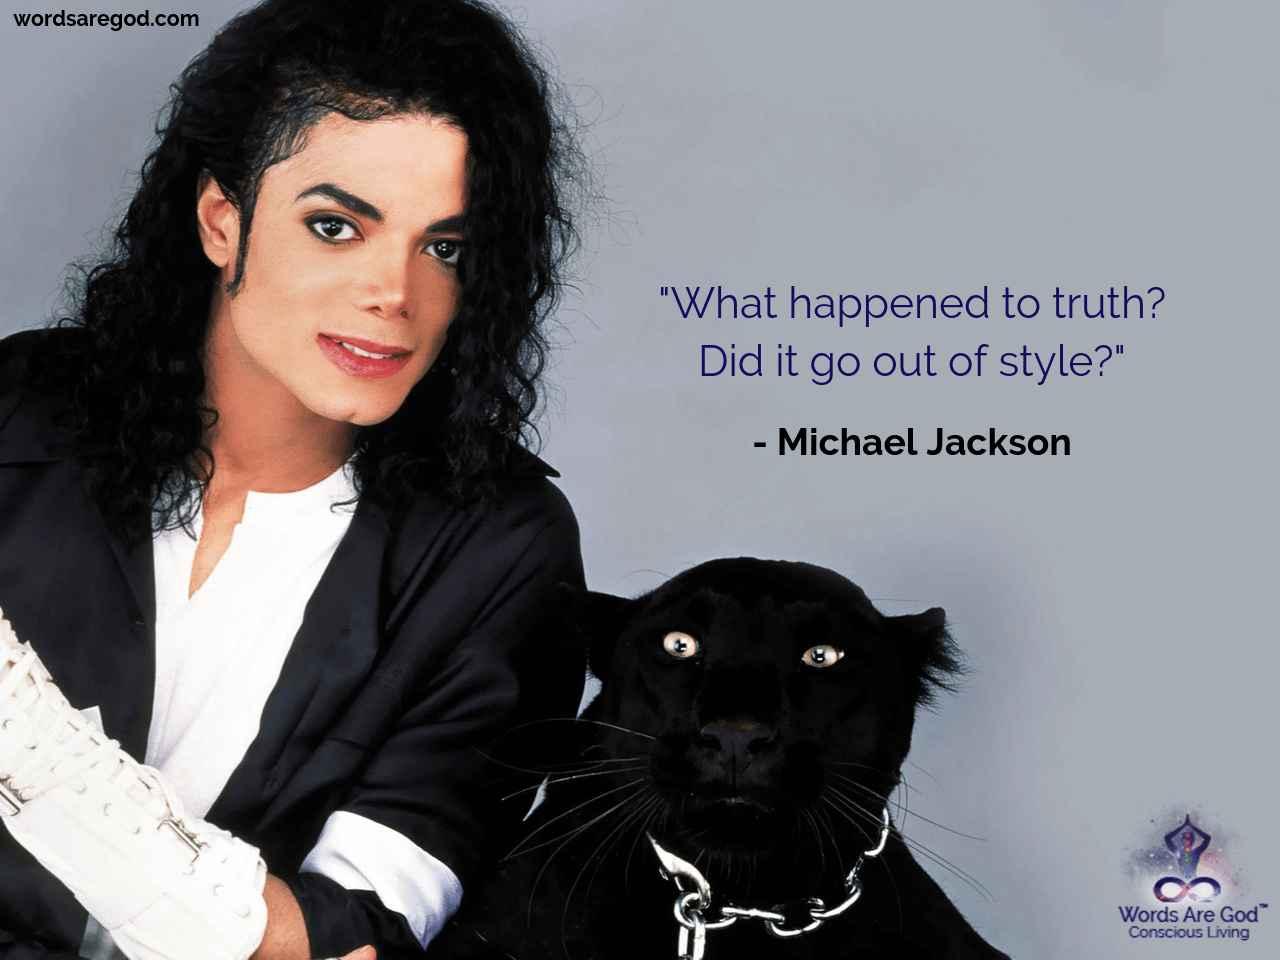 Michael Jackson Inspirational Quote by Michael Jackson